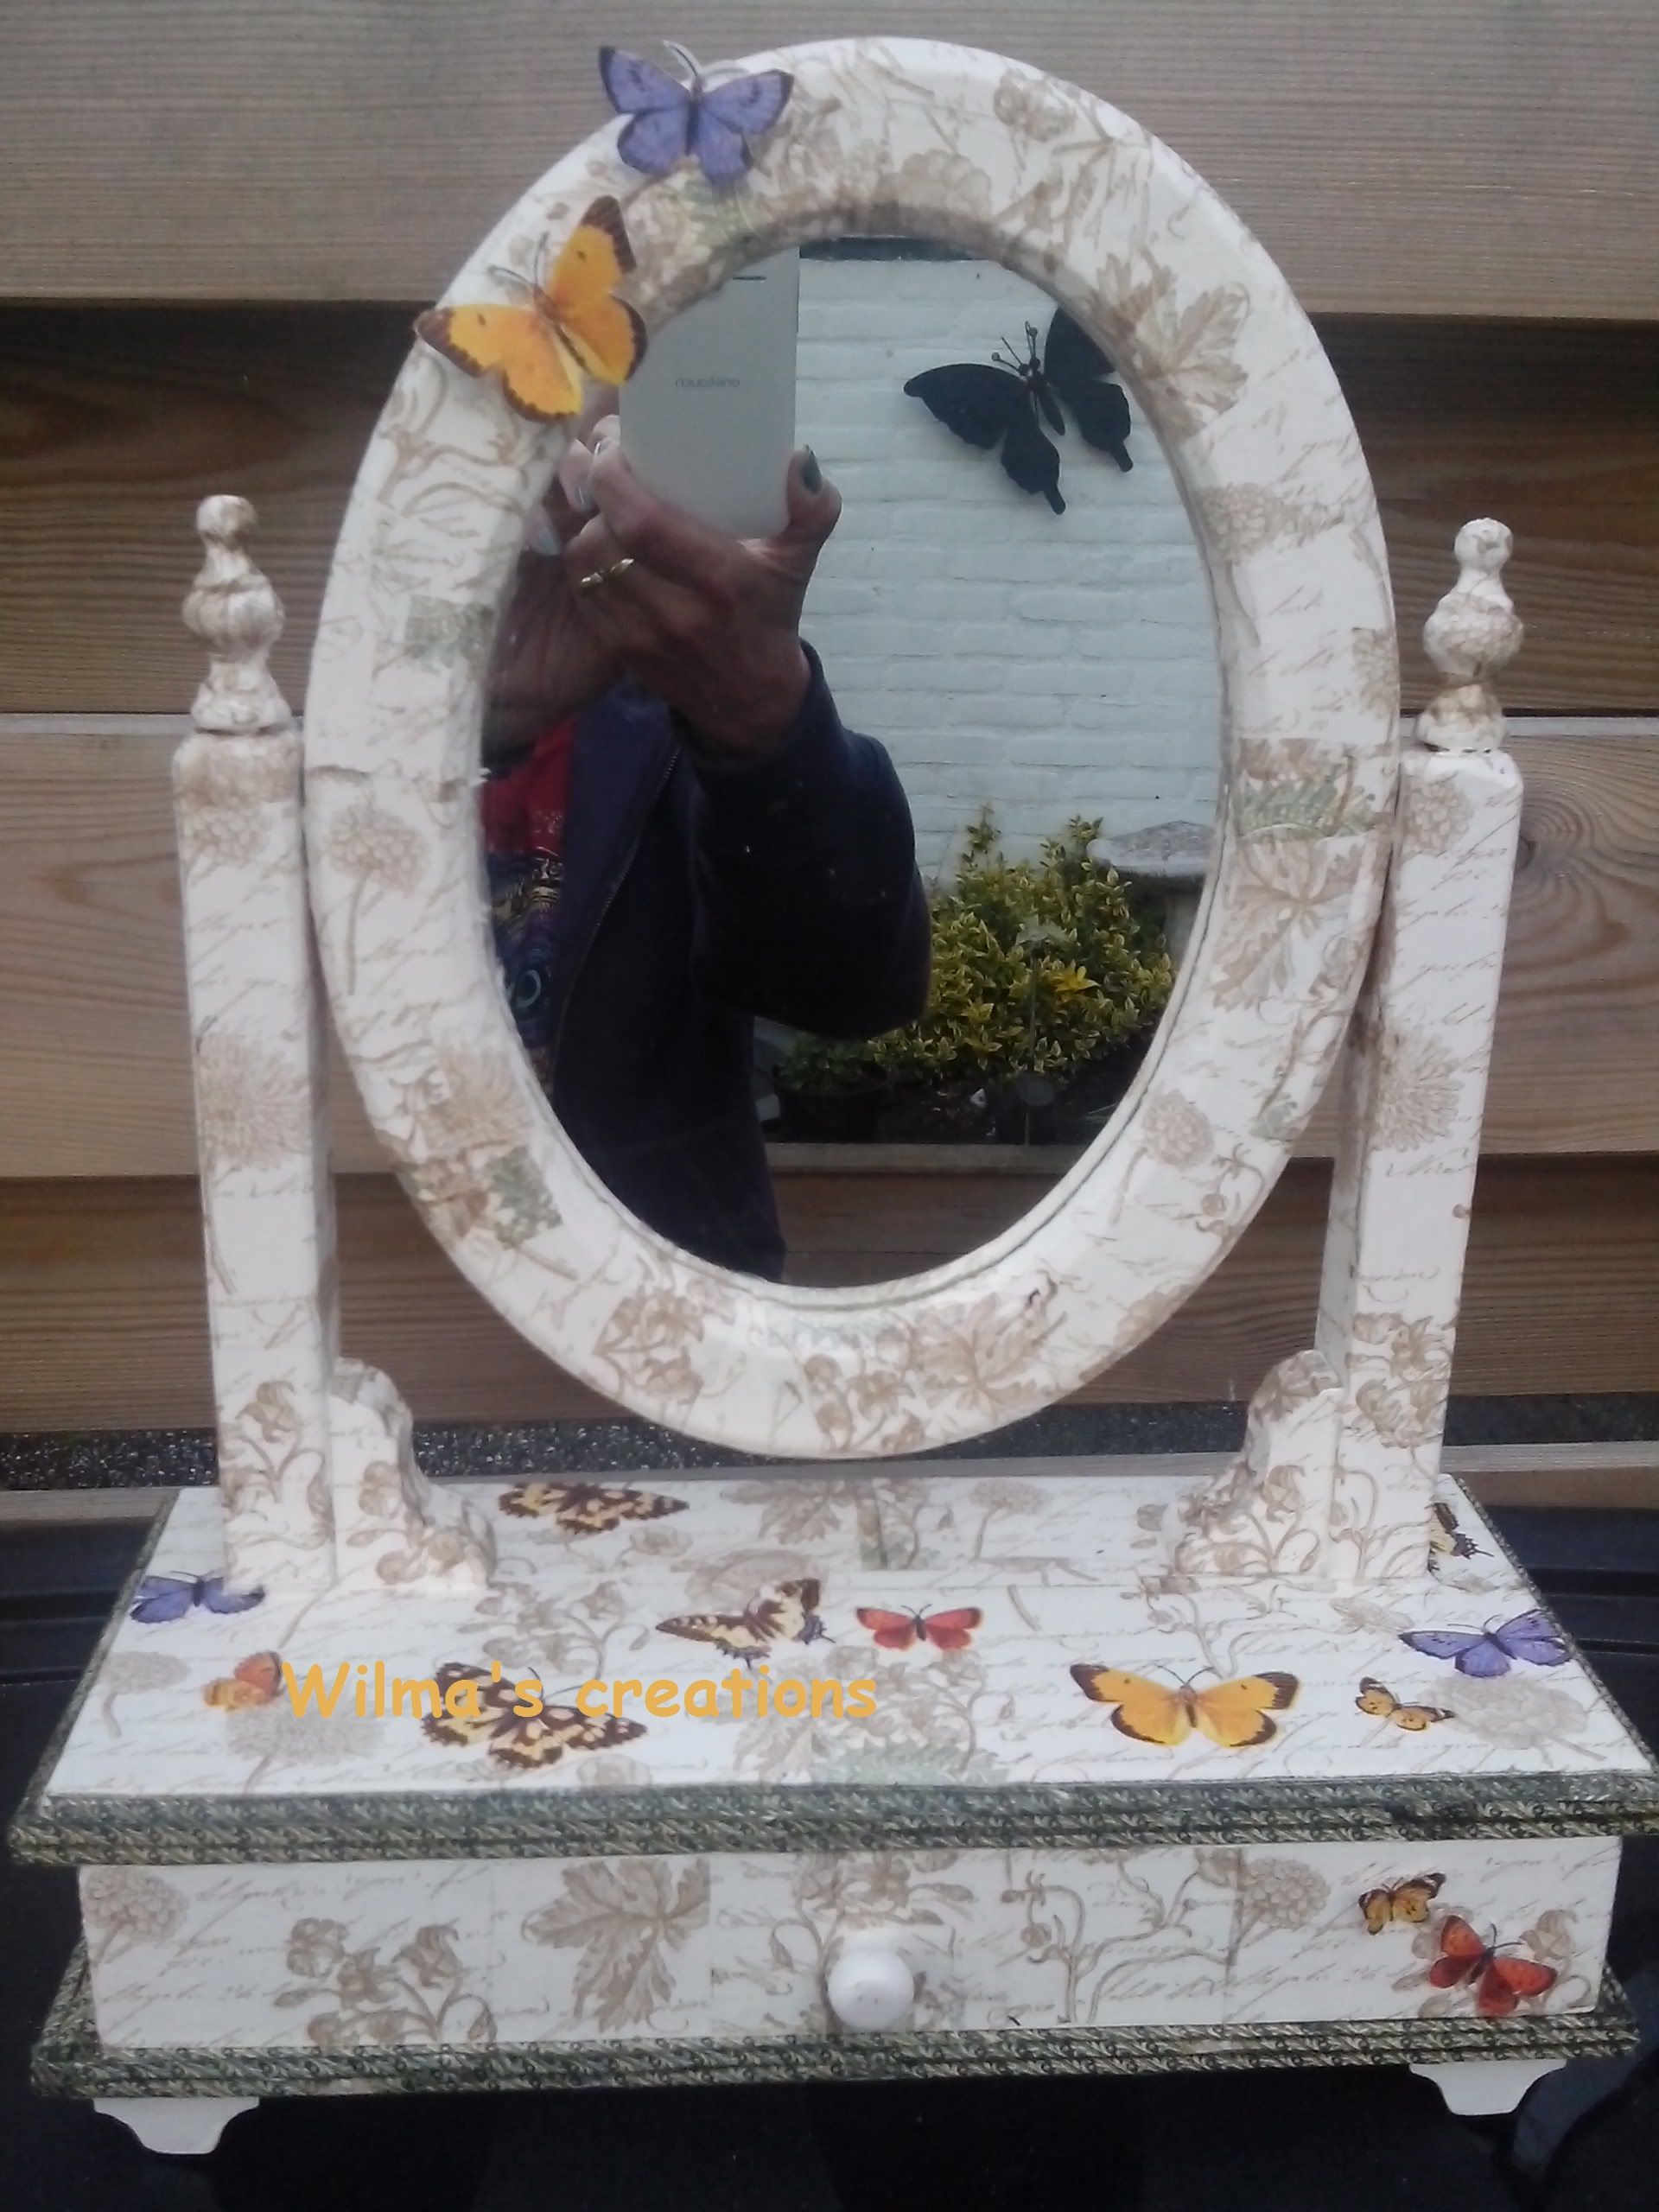 Mirror, decoupage. Wilma's creations.